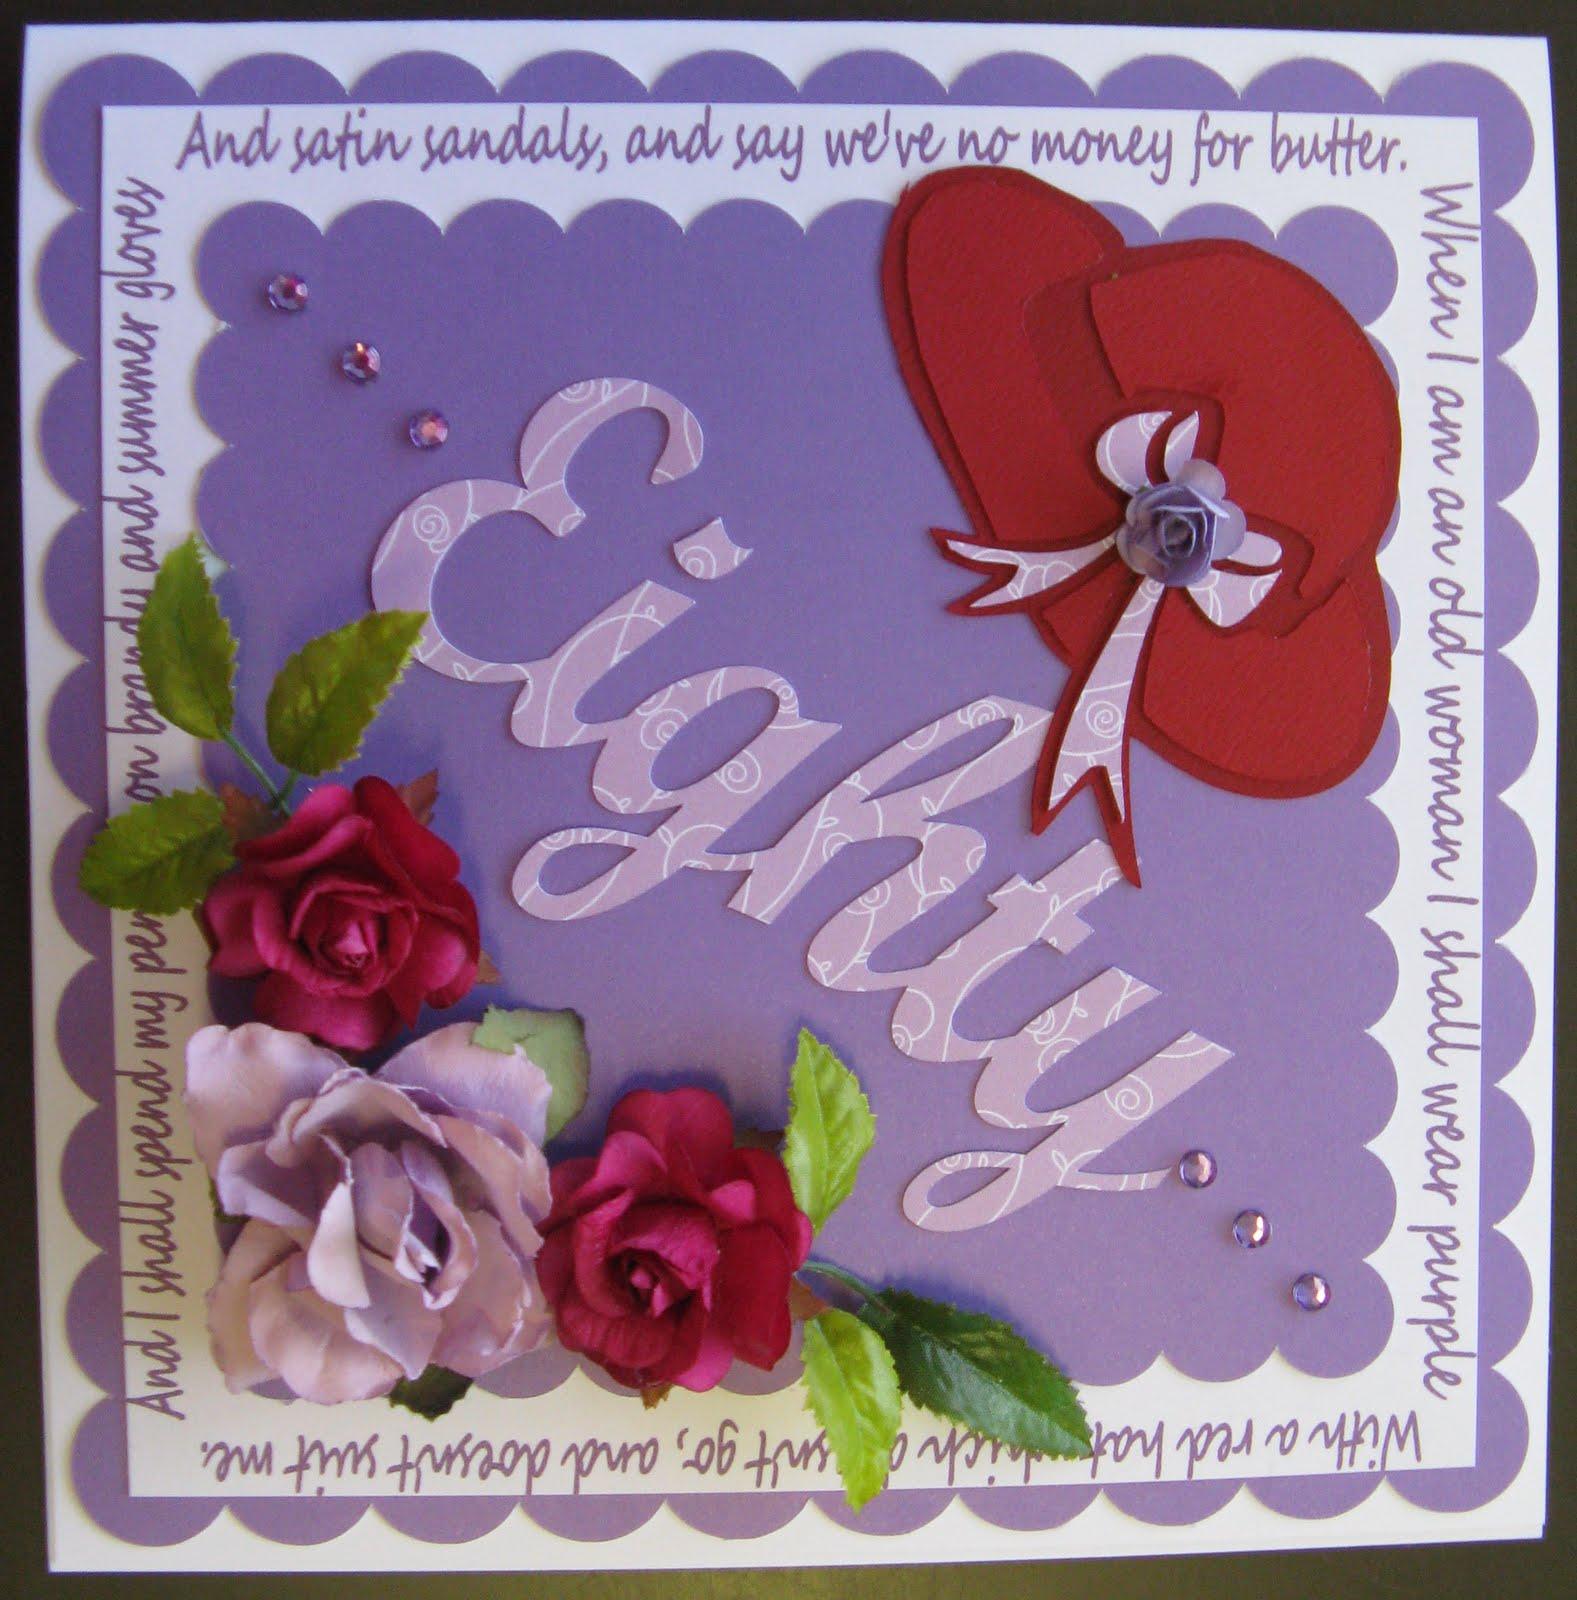 Old Woman Birthday Card Free Birthday Cards